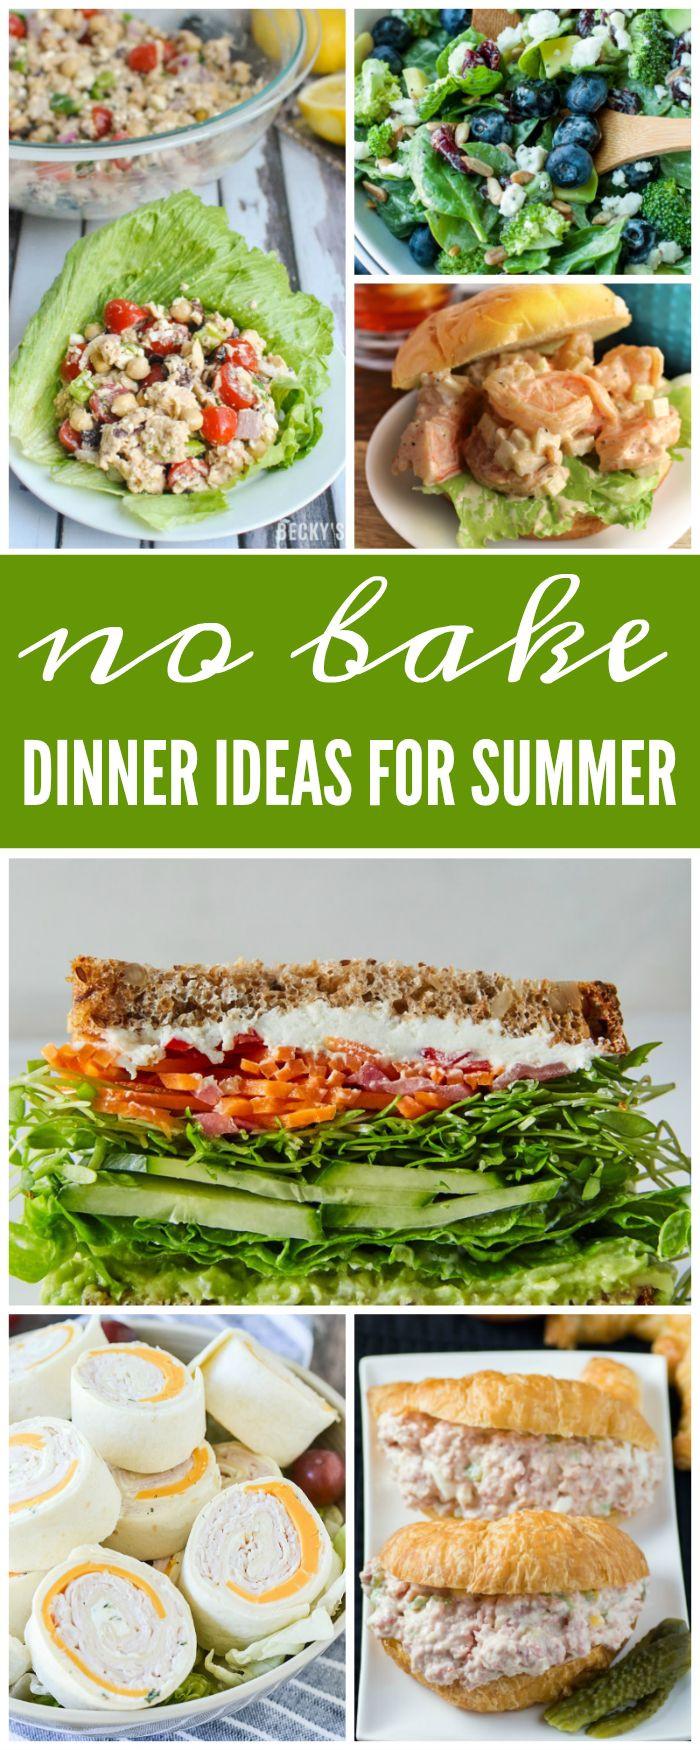 Light Dinner Ideas For Summer  Best 25 Cool summer dinners ideas on Pinterest